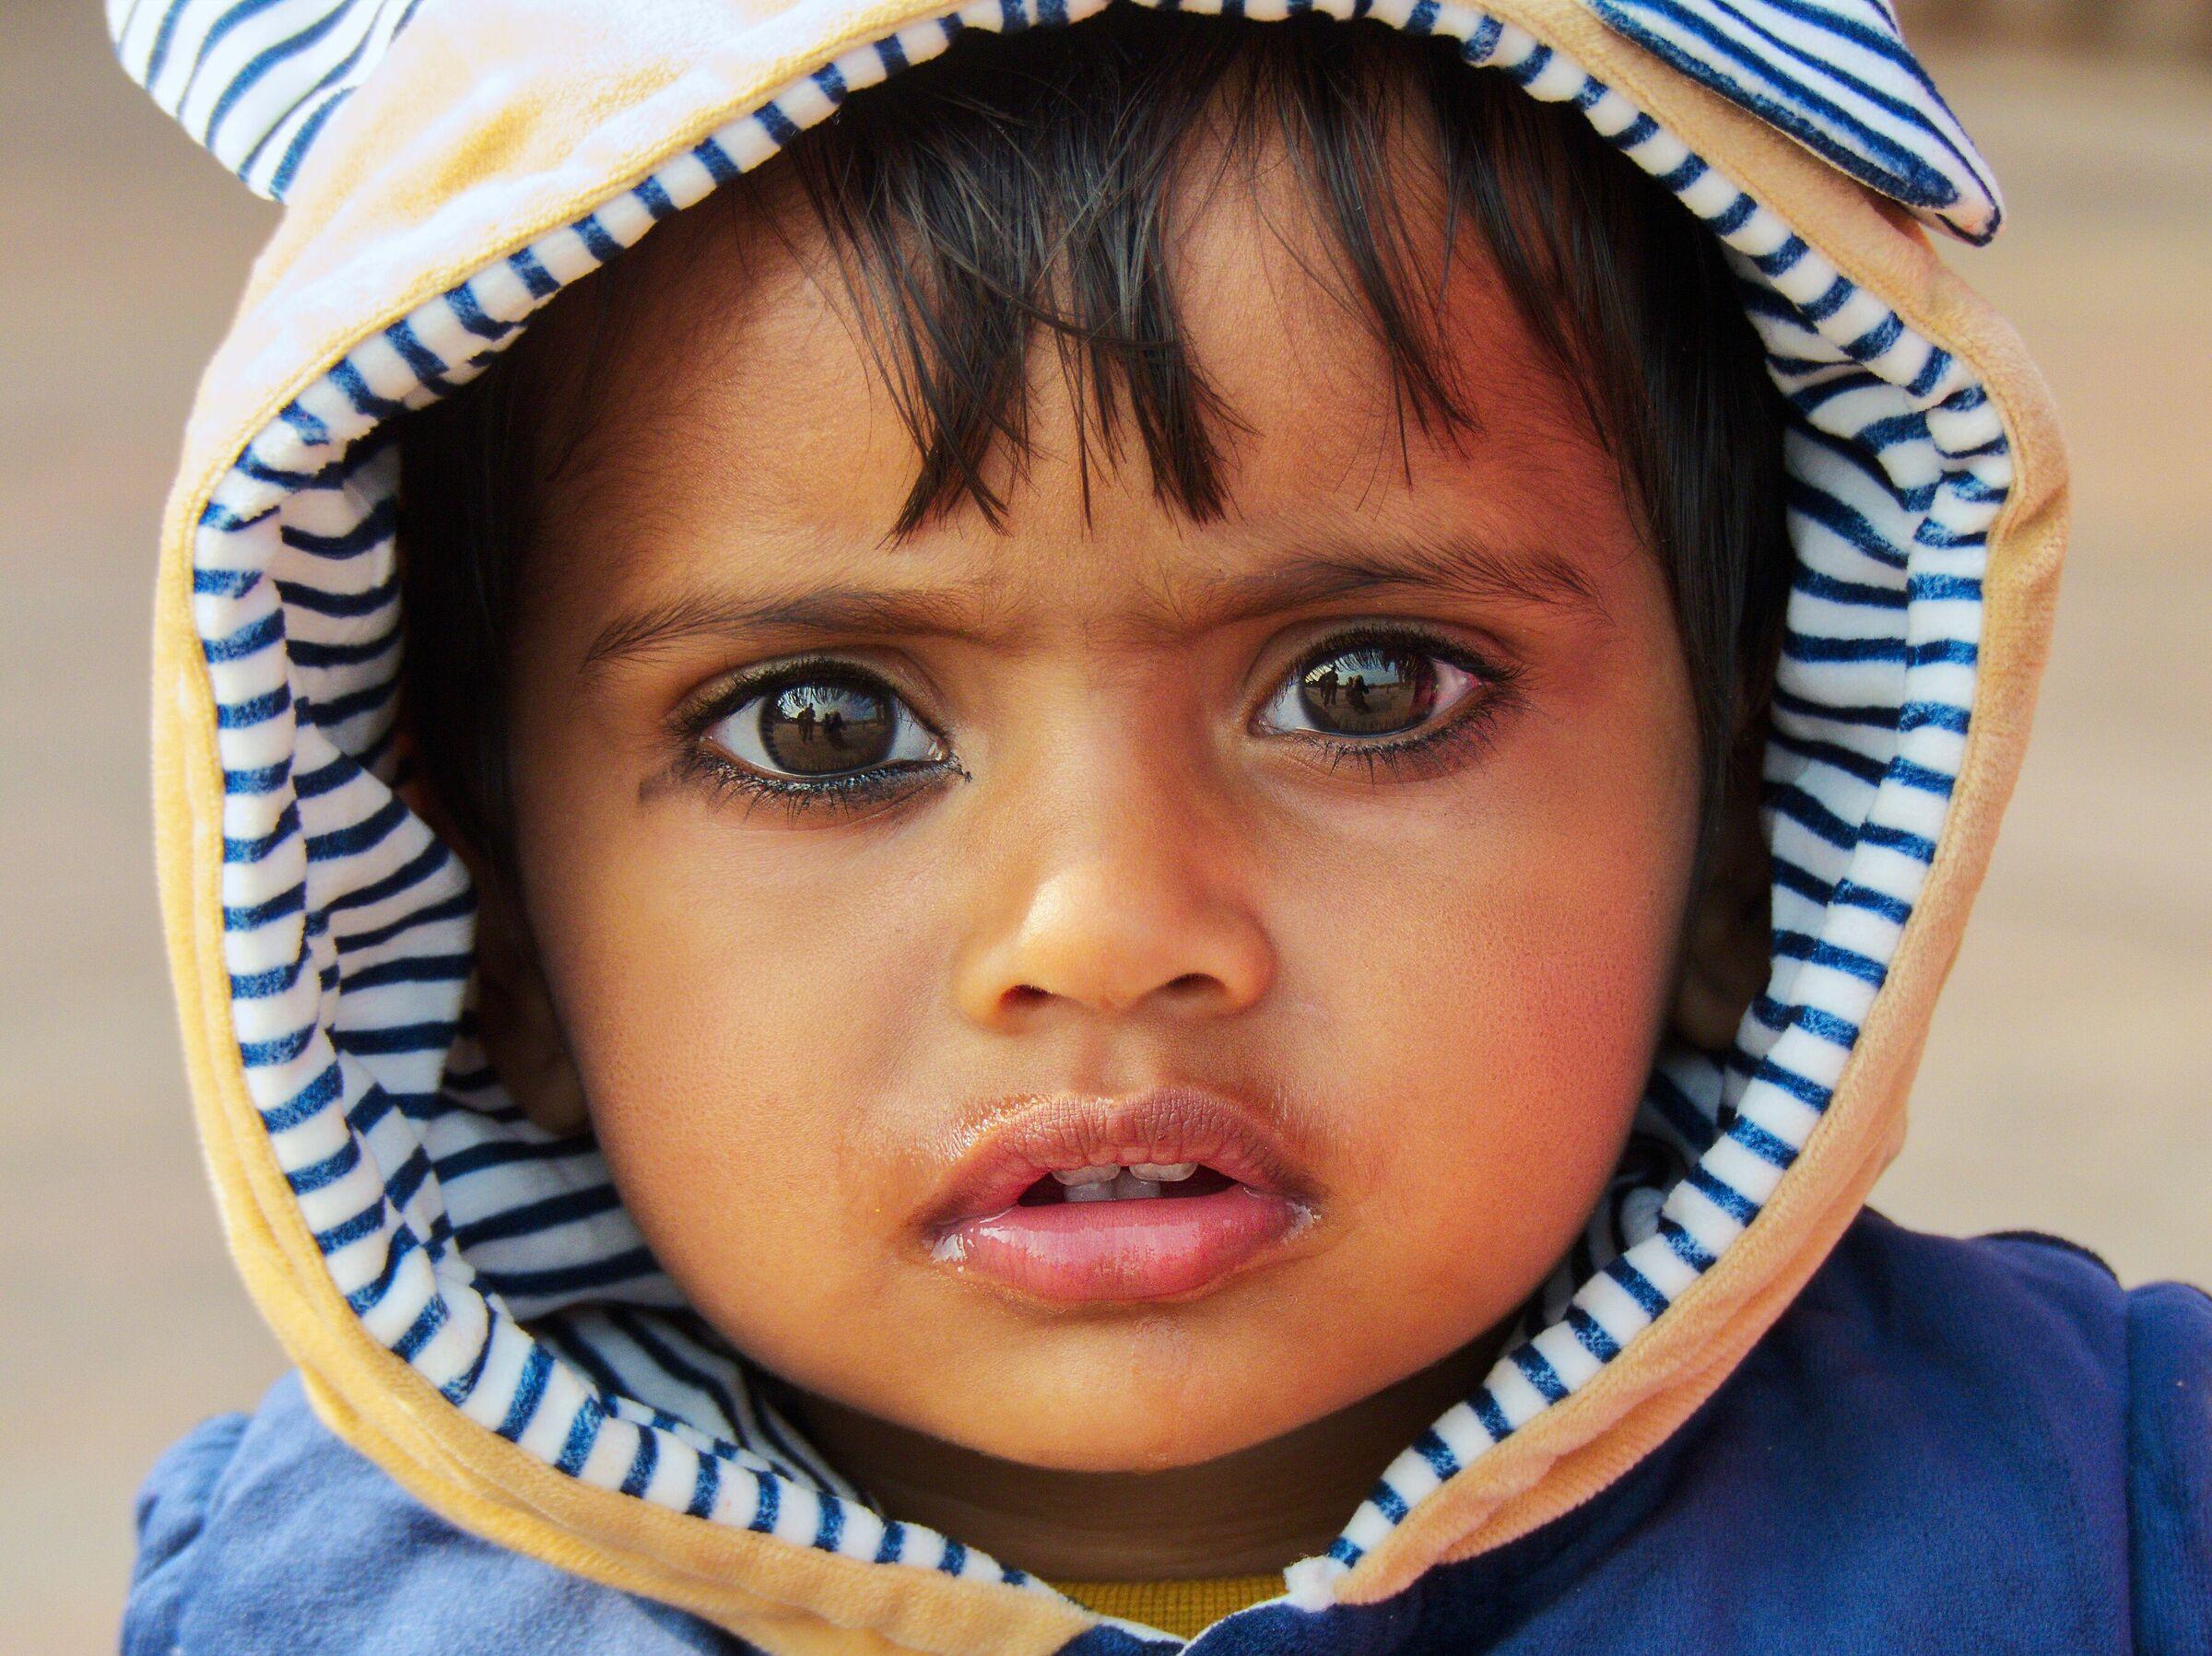 Rajasthan, occhi di bimbo....